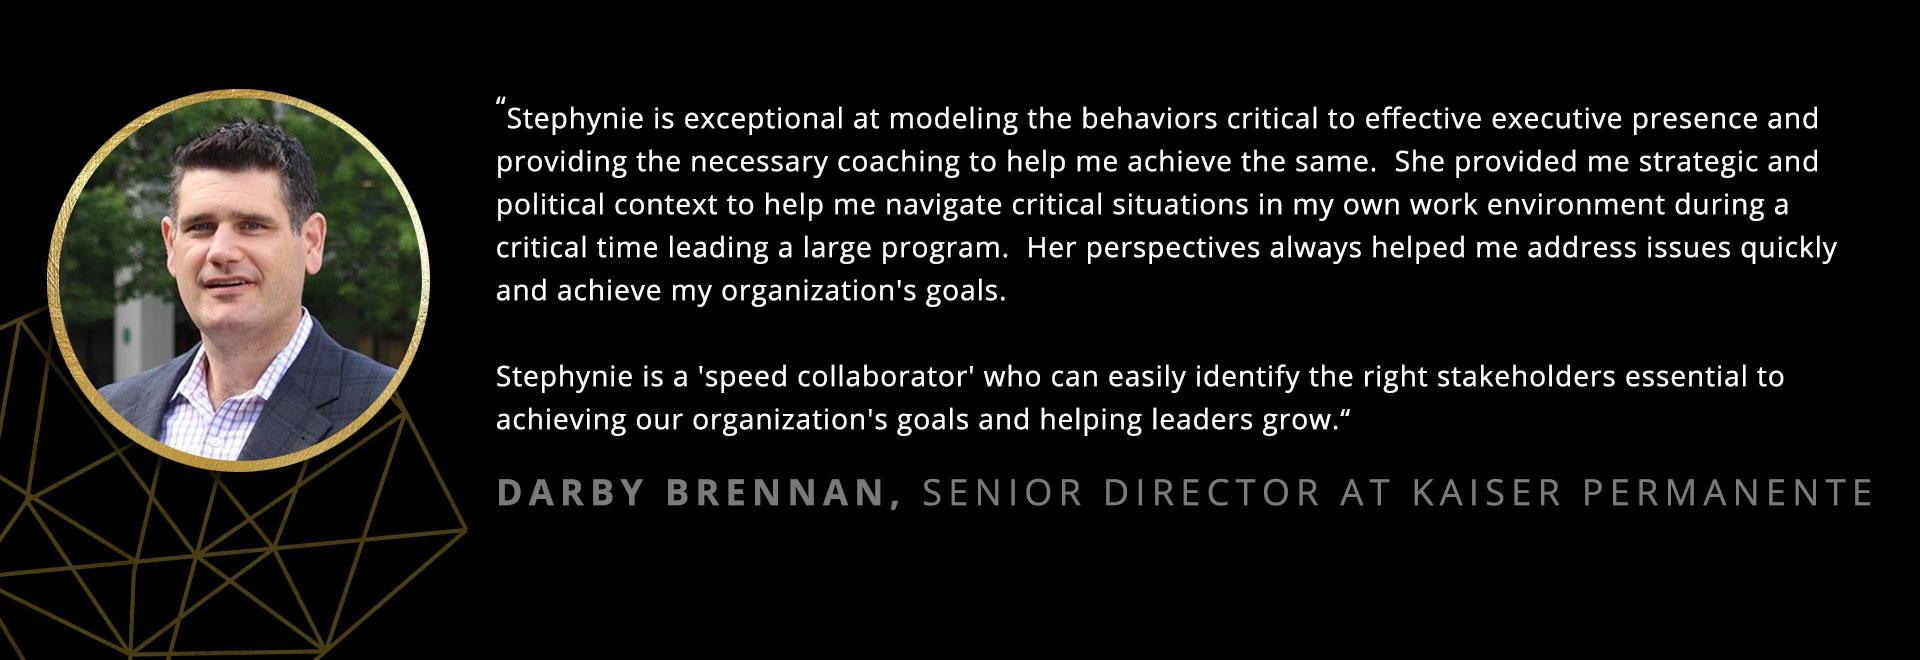 Testimonial_Brennan.jpg